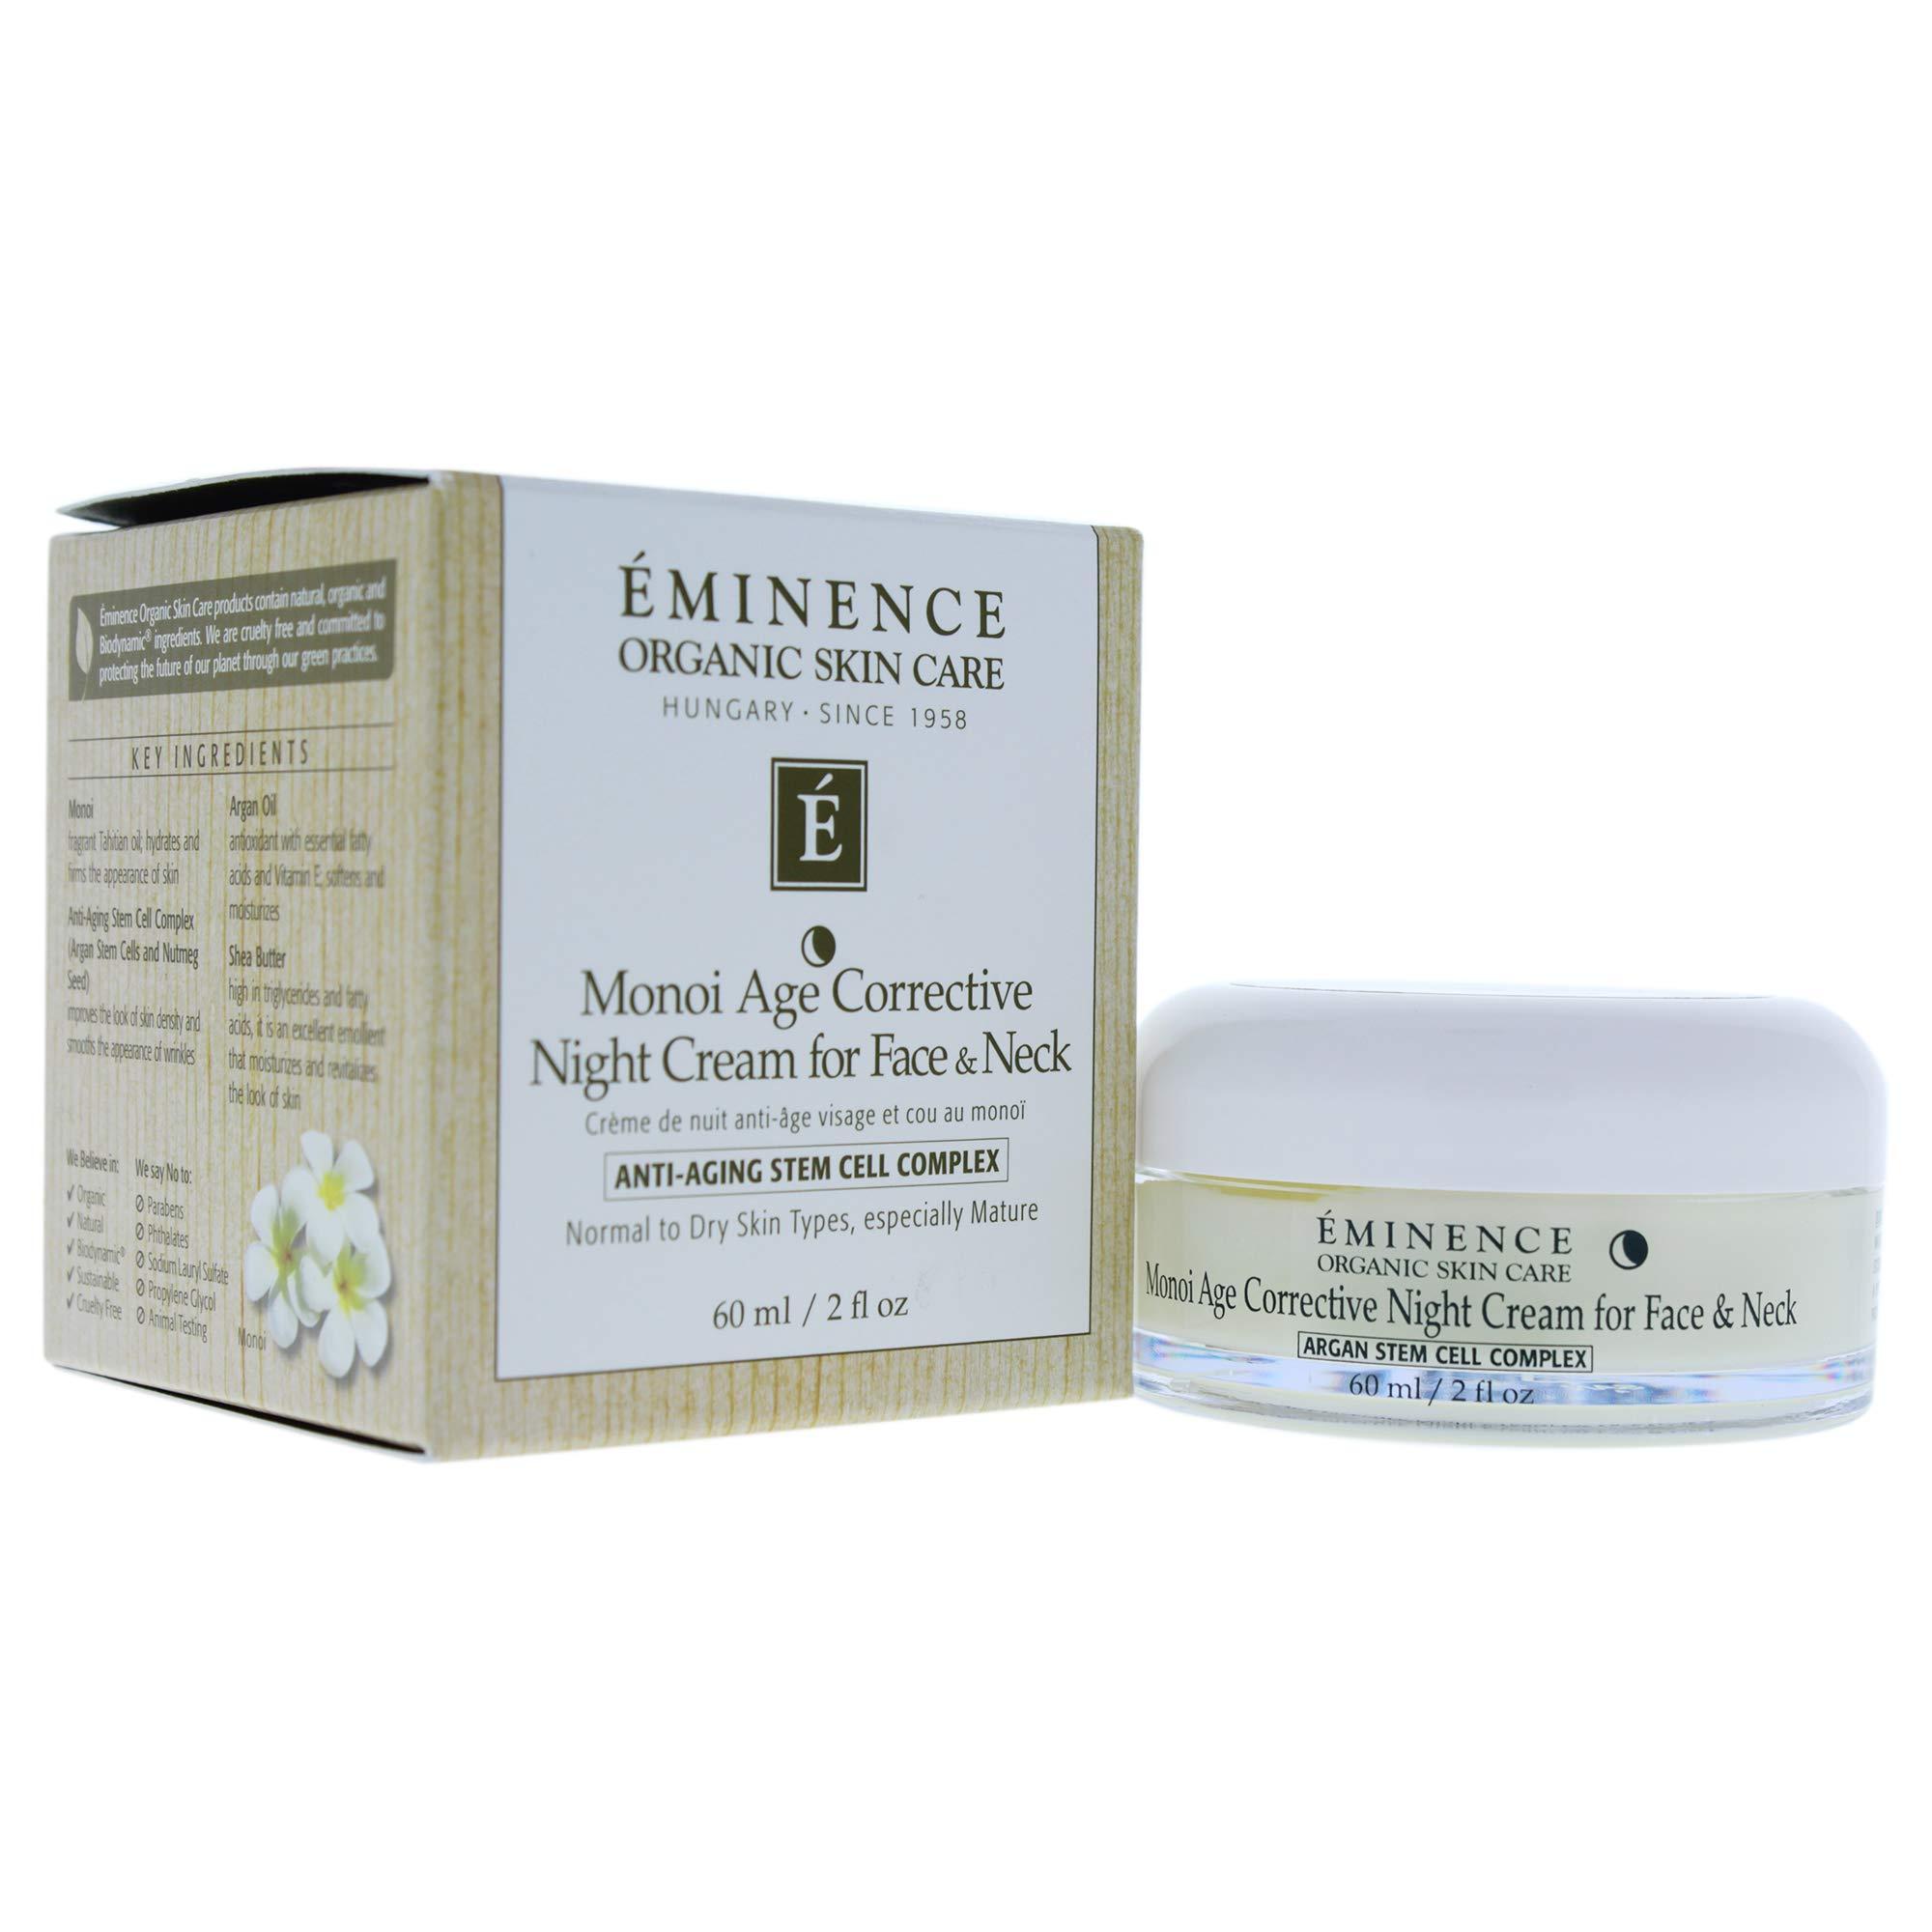 Eminence Organic Skincare Monoi Age Corrective Night Cream, 2 Ounce by Eminence